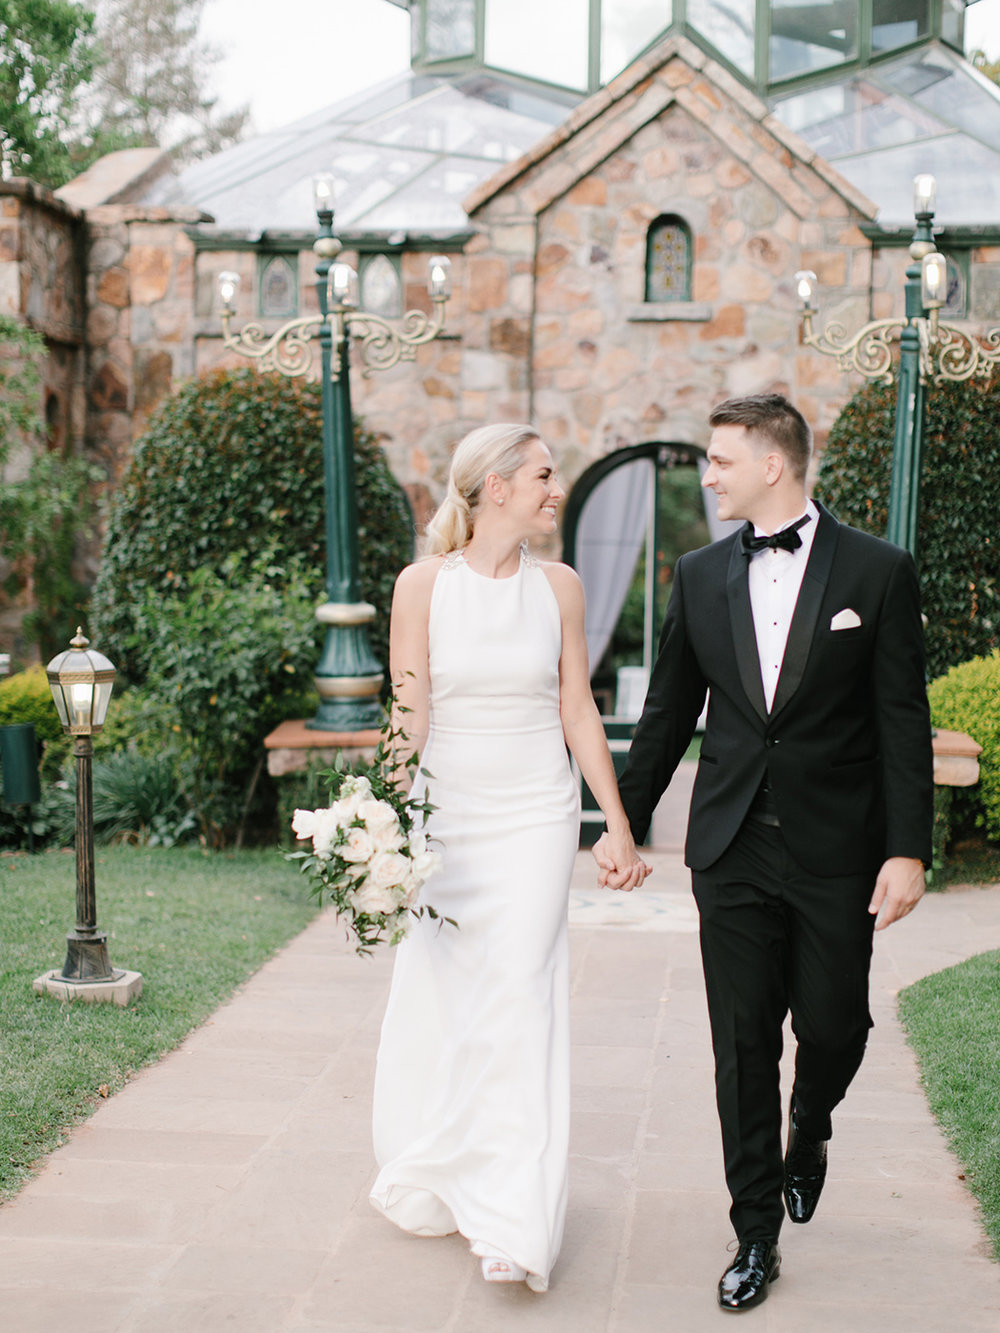 Wedding Couple | Rensche Mari Photography